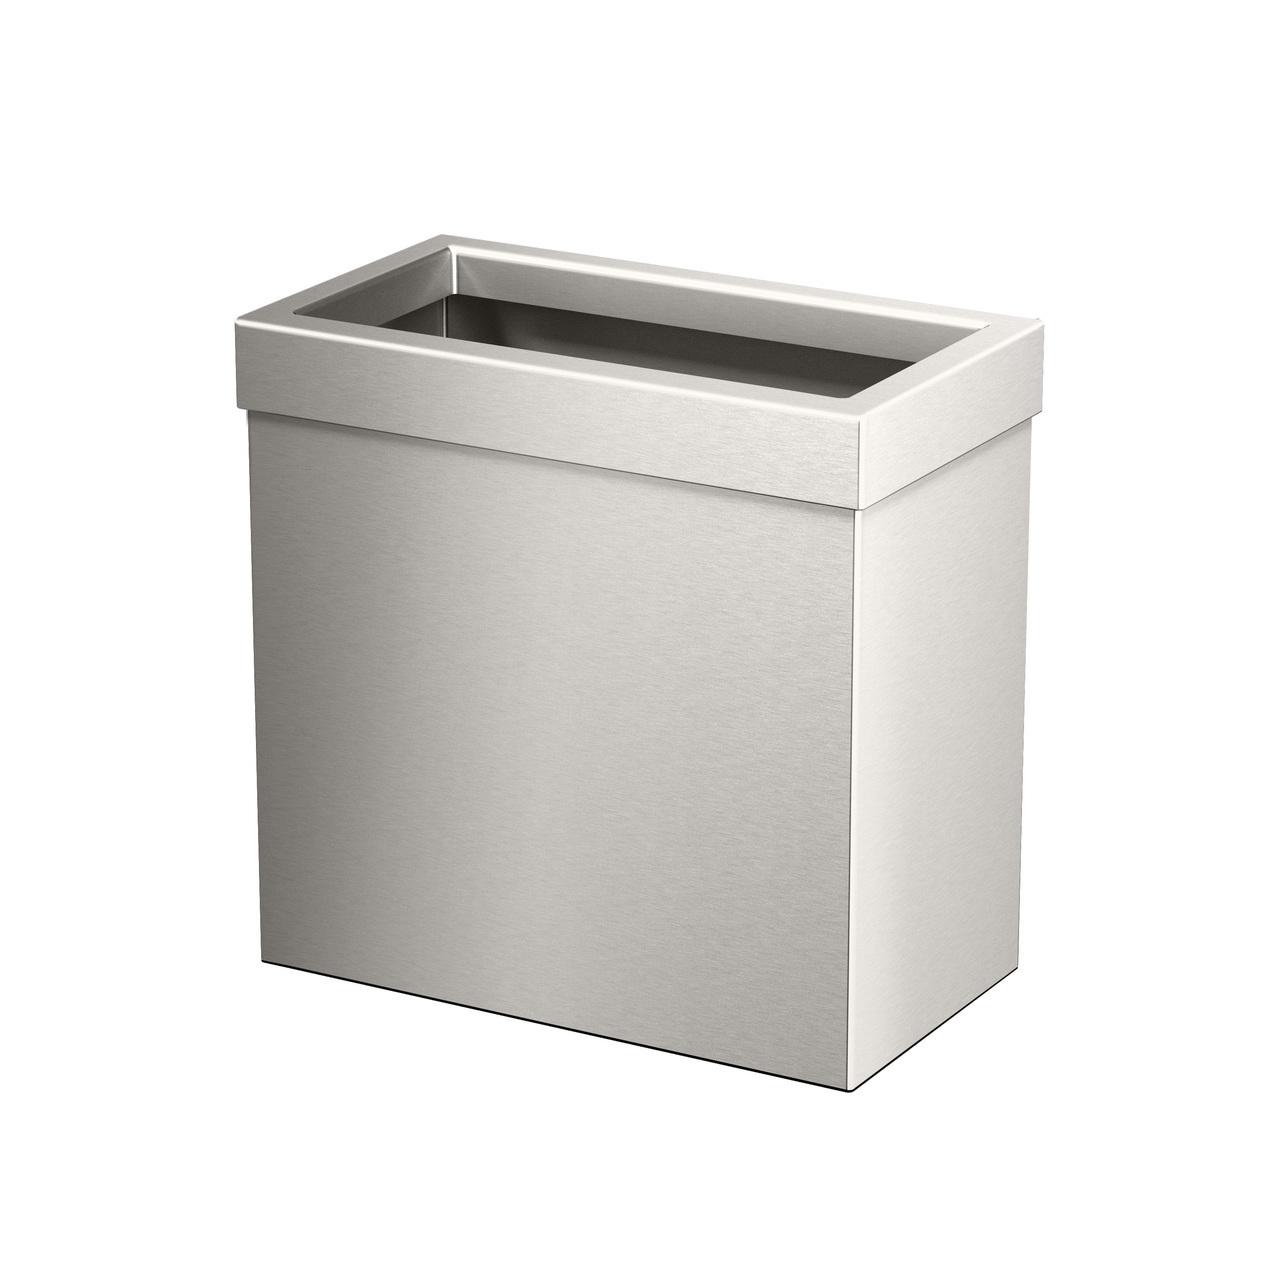 Rectangle Modern Waste Basket in Satin Nickel